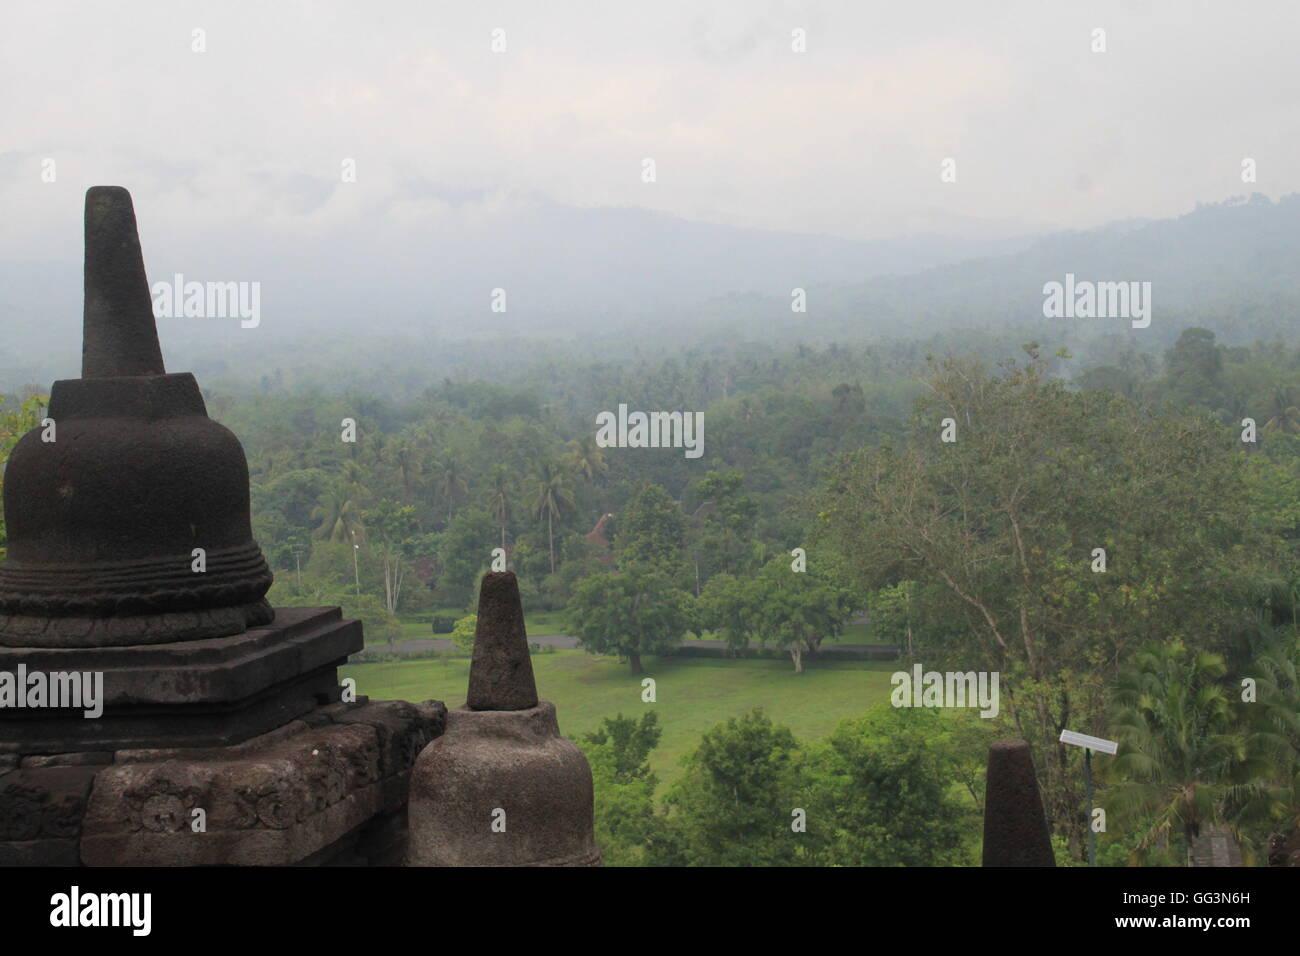 View From Borobudur Temple Yogyakarta Central Java - Stock Image